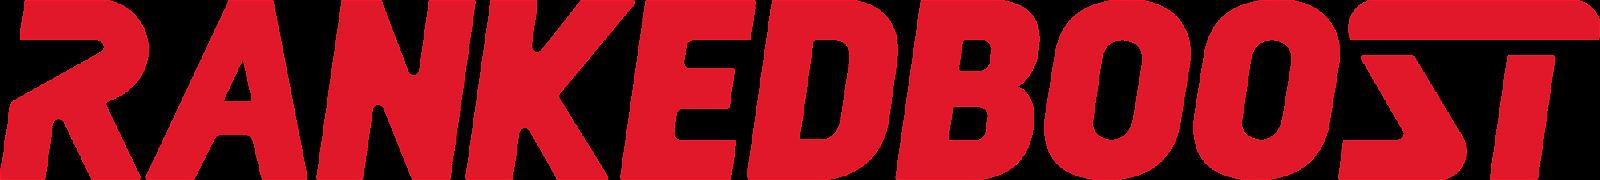 RankedBoost Logo